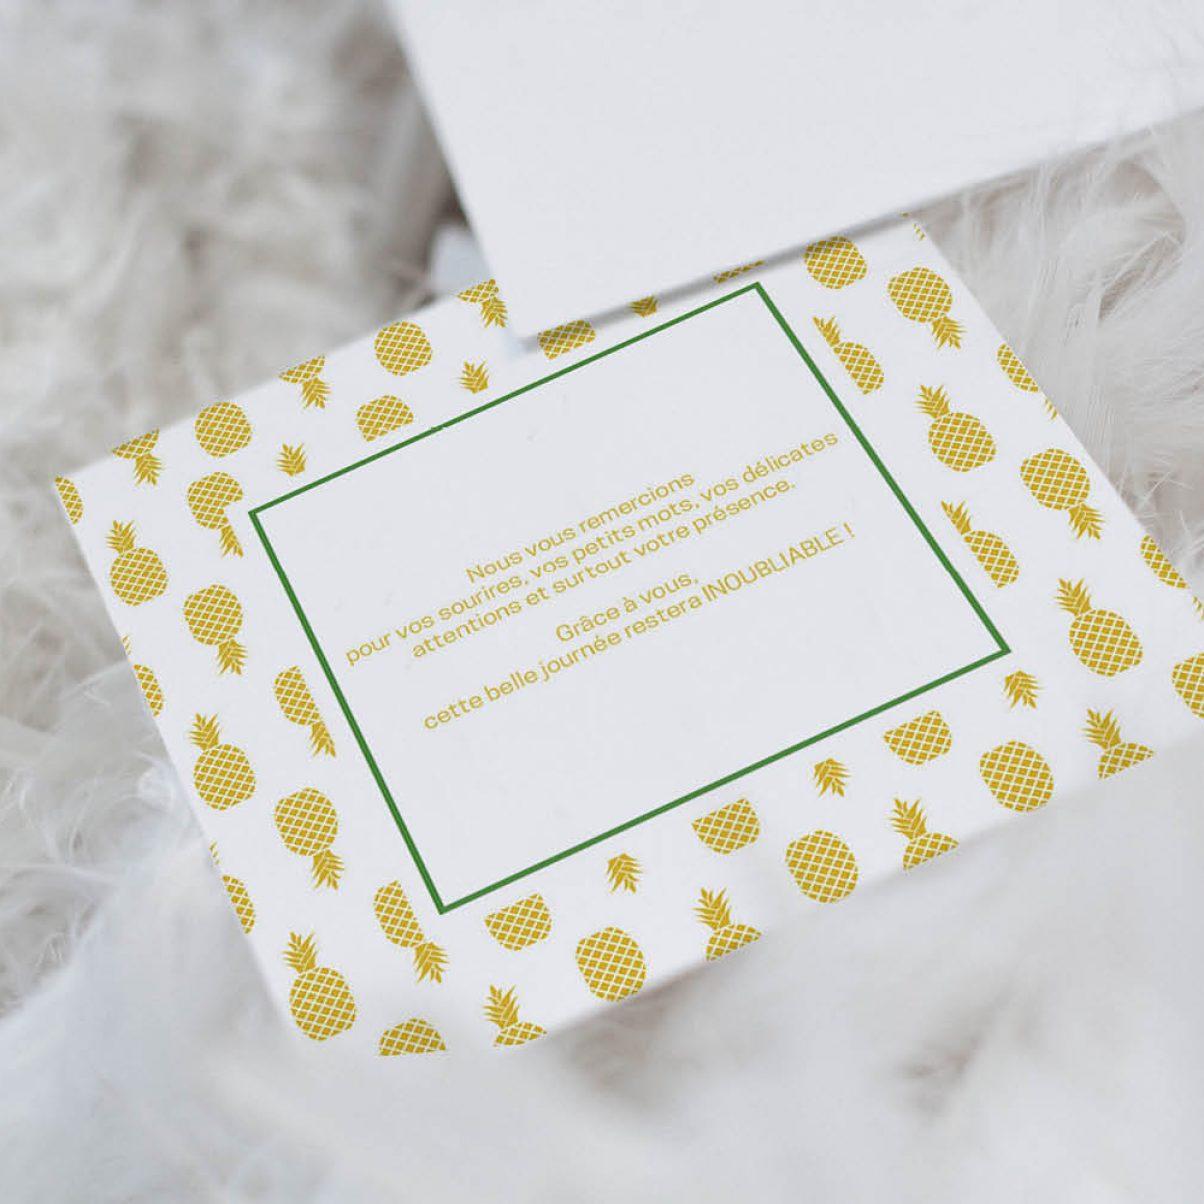 Le carton de remerciements du mariage de Julia & Thibaut - verso